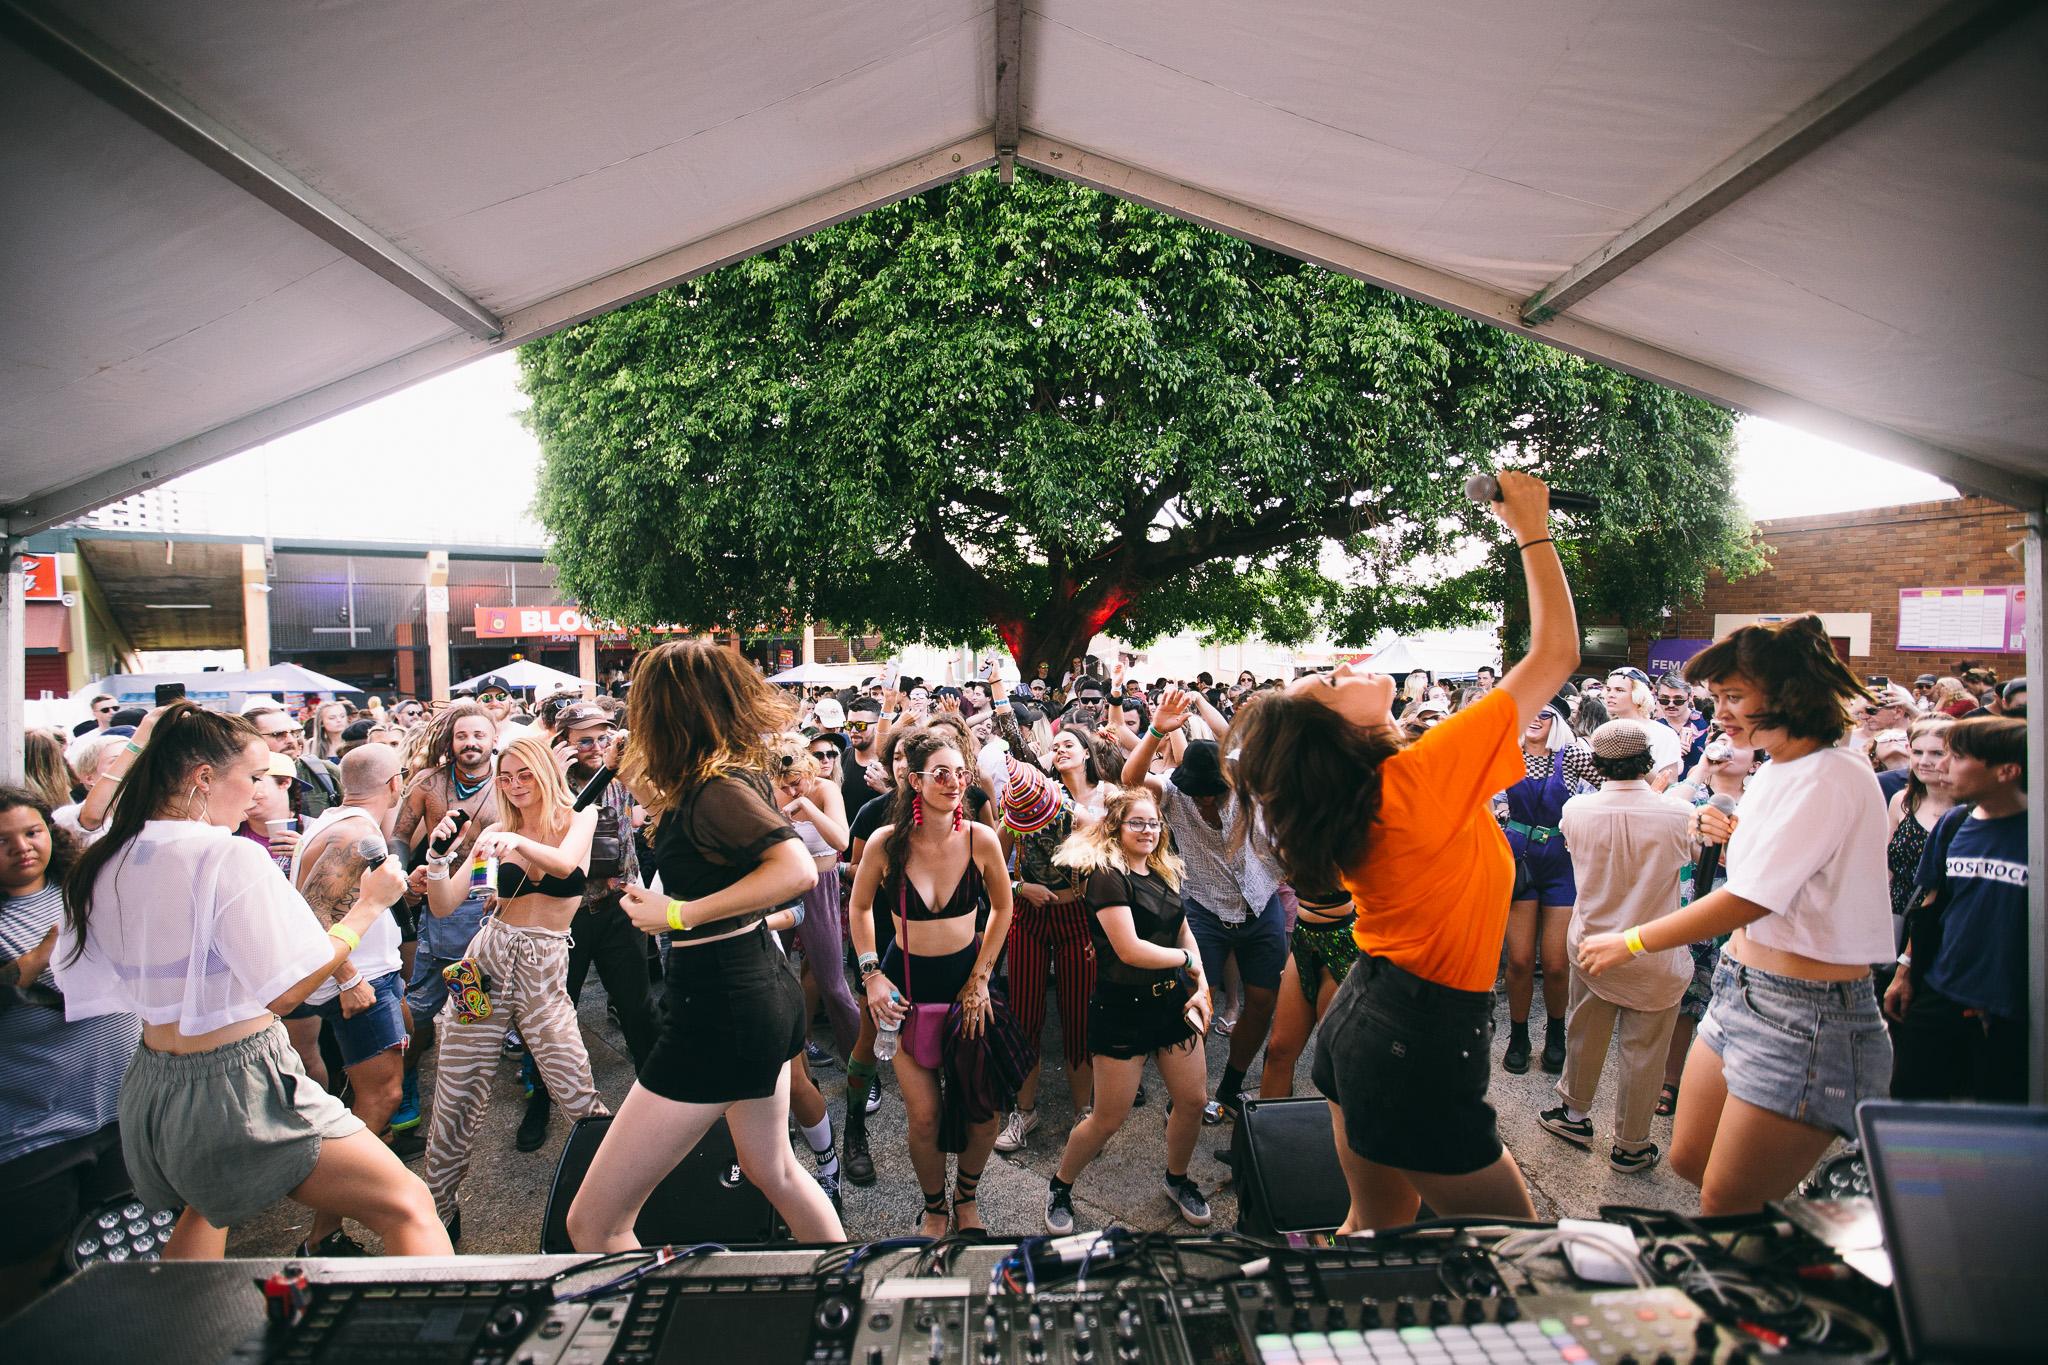 Haiku Hands_Laneway-Festival-Brisbane-2018_Credit-Bianca-Holderness-1.jpg